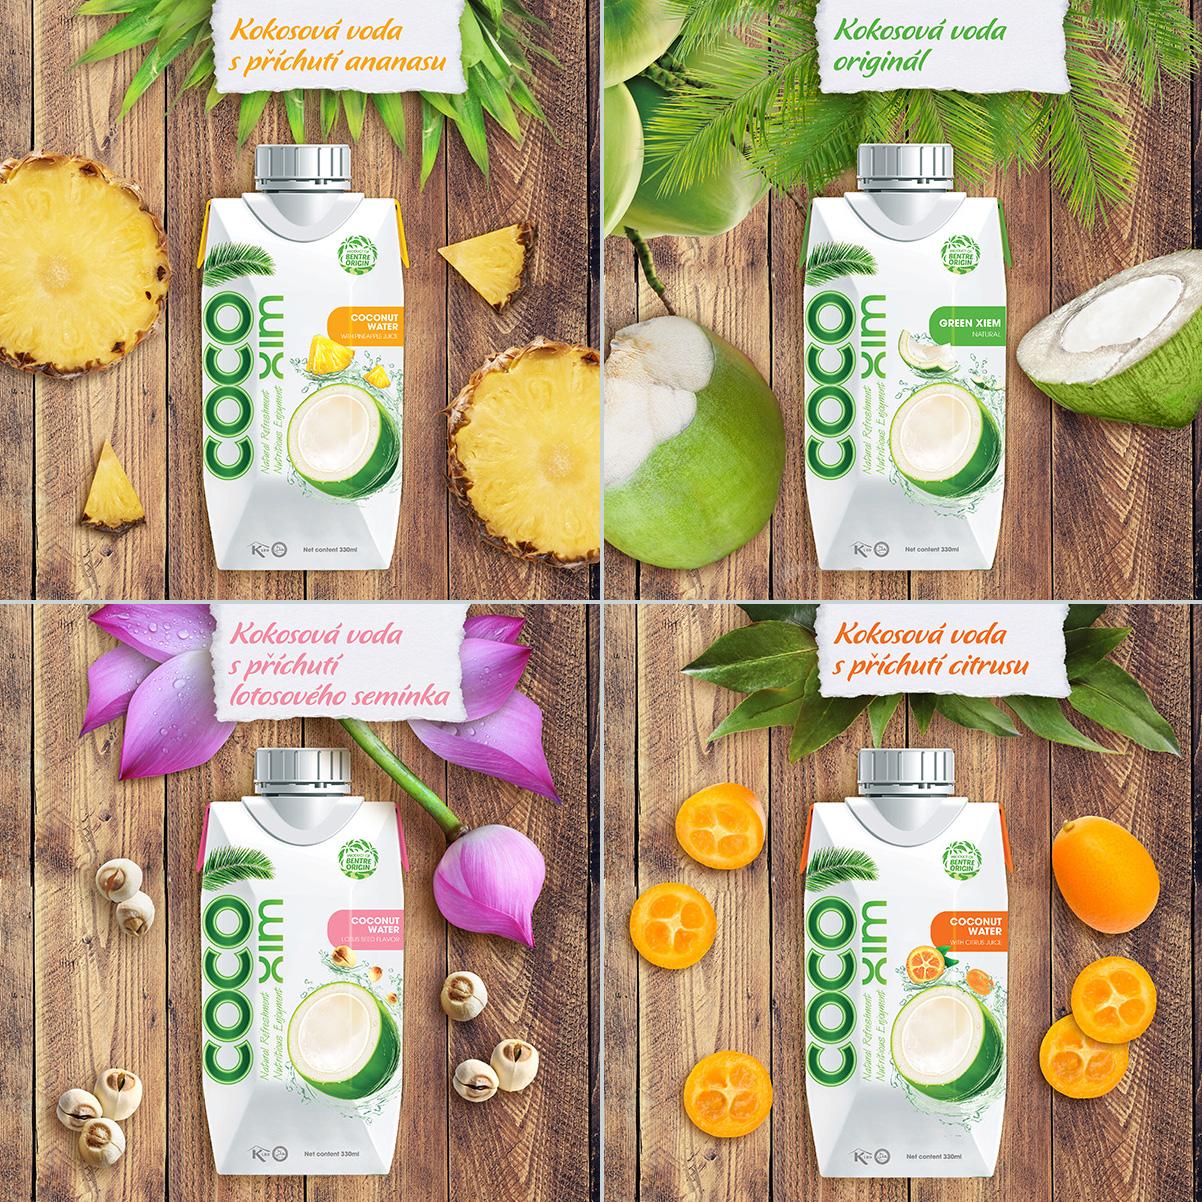 Kokosová voda CocoXim-2